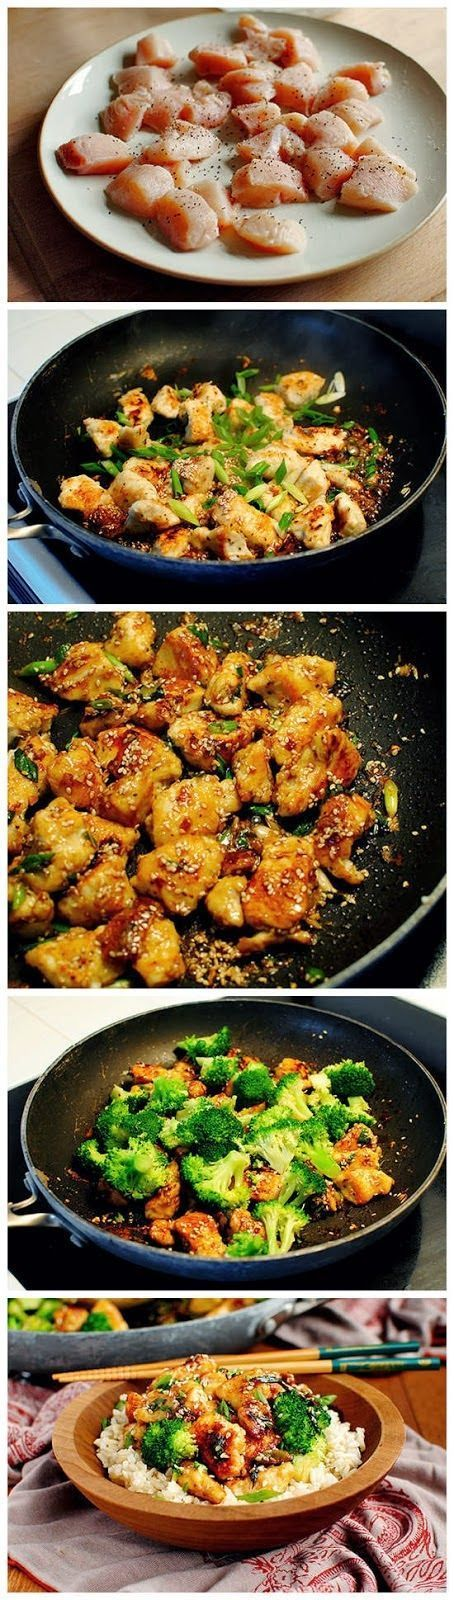 Made it & LOVED IT!!! Lighter Sesame Chicken (broccoli, green onion, brown rice, honey, sesame seeds, soy sauce, garlic, egg, cornstarch, s&p, oil)